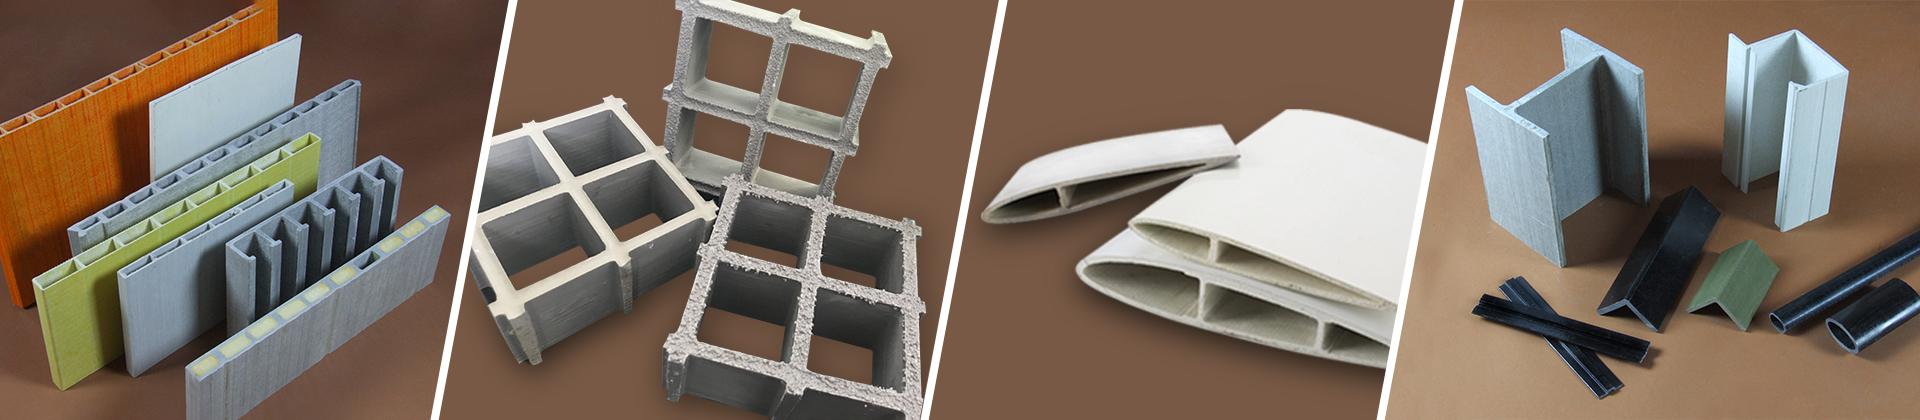 fiberglass, fiberglass stake, pultrusion, fiberglass decking, fiberglass grating,  fiberglass rebar, carbon fiber tube, carbon fiber roller